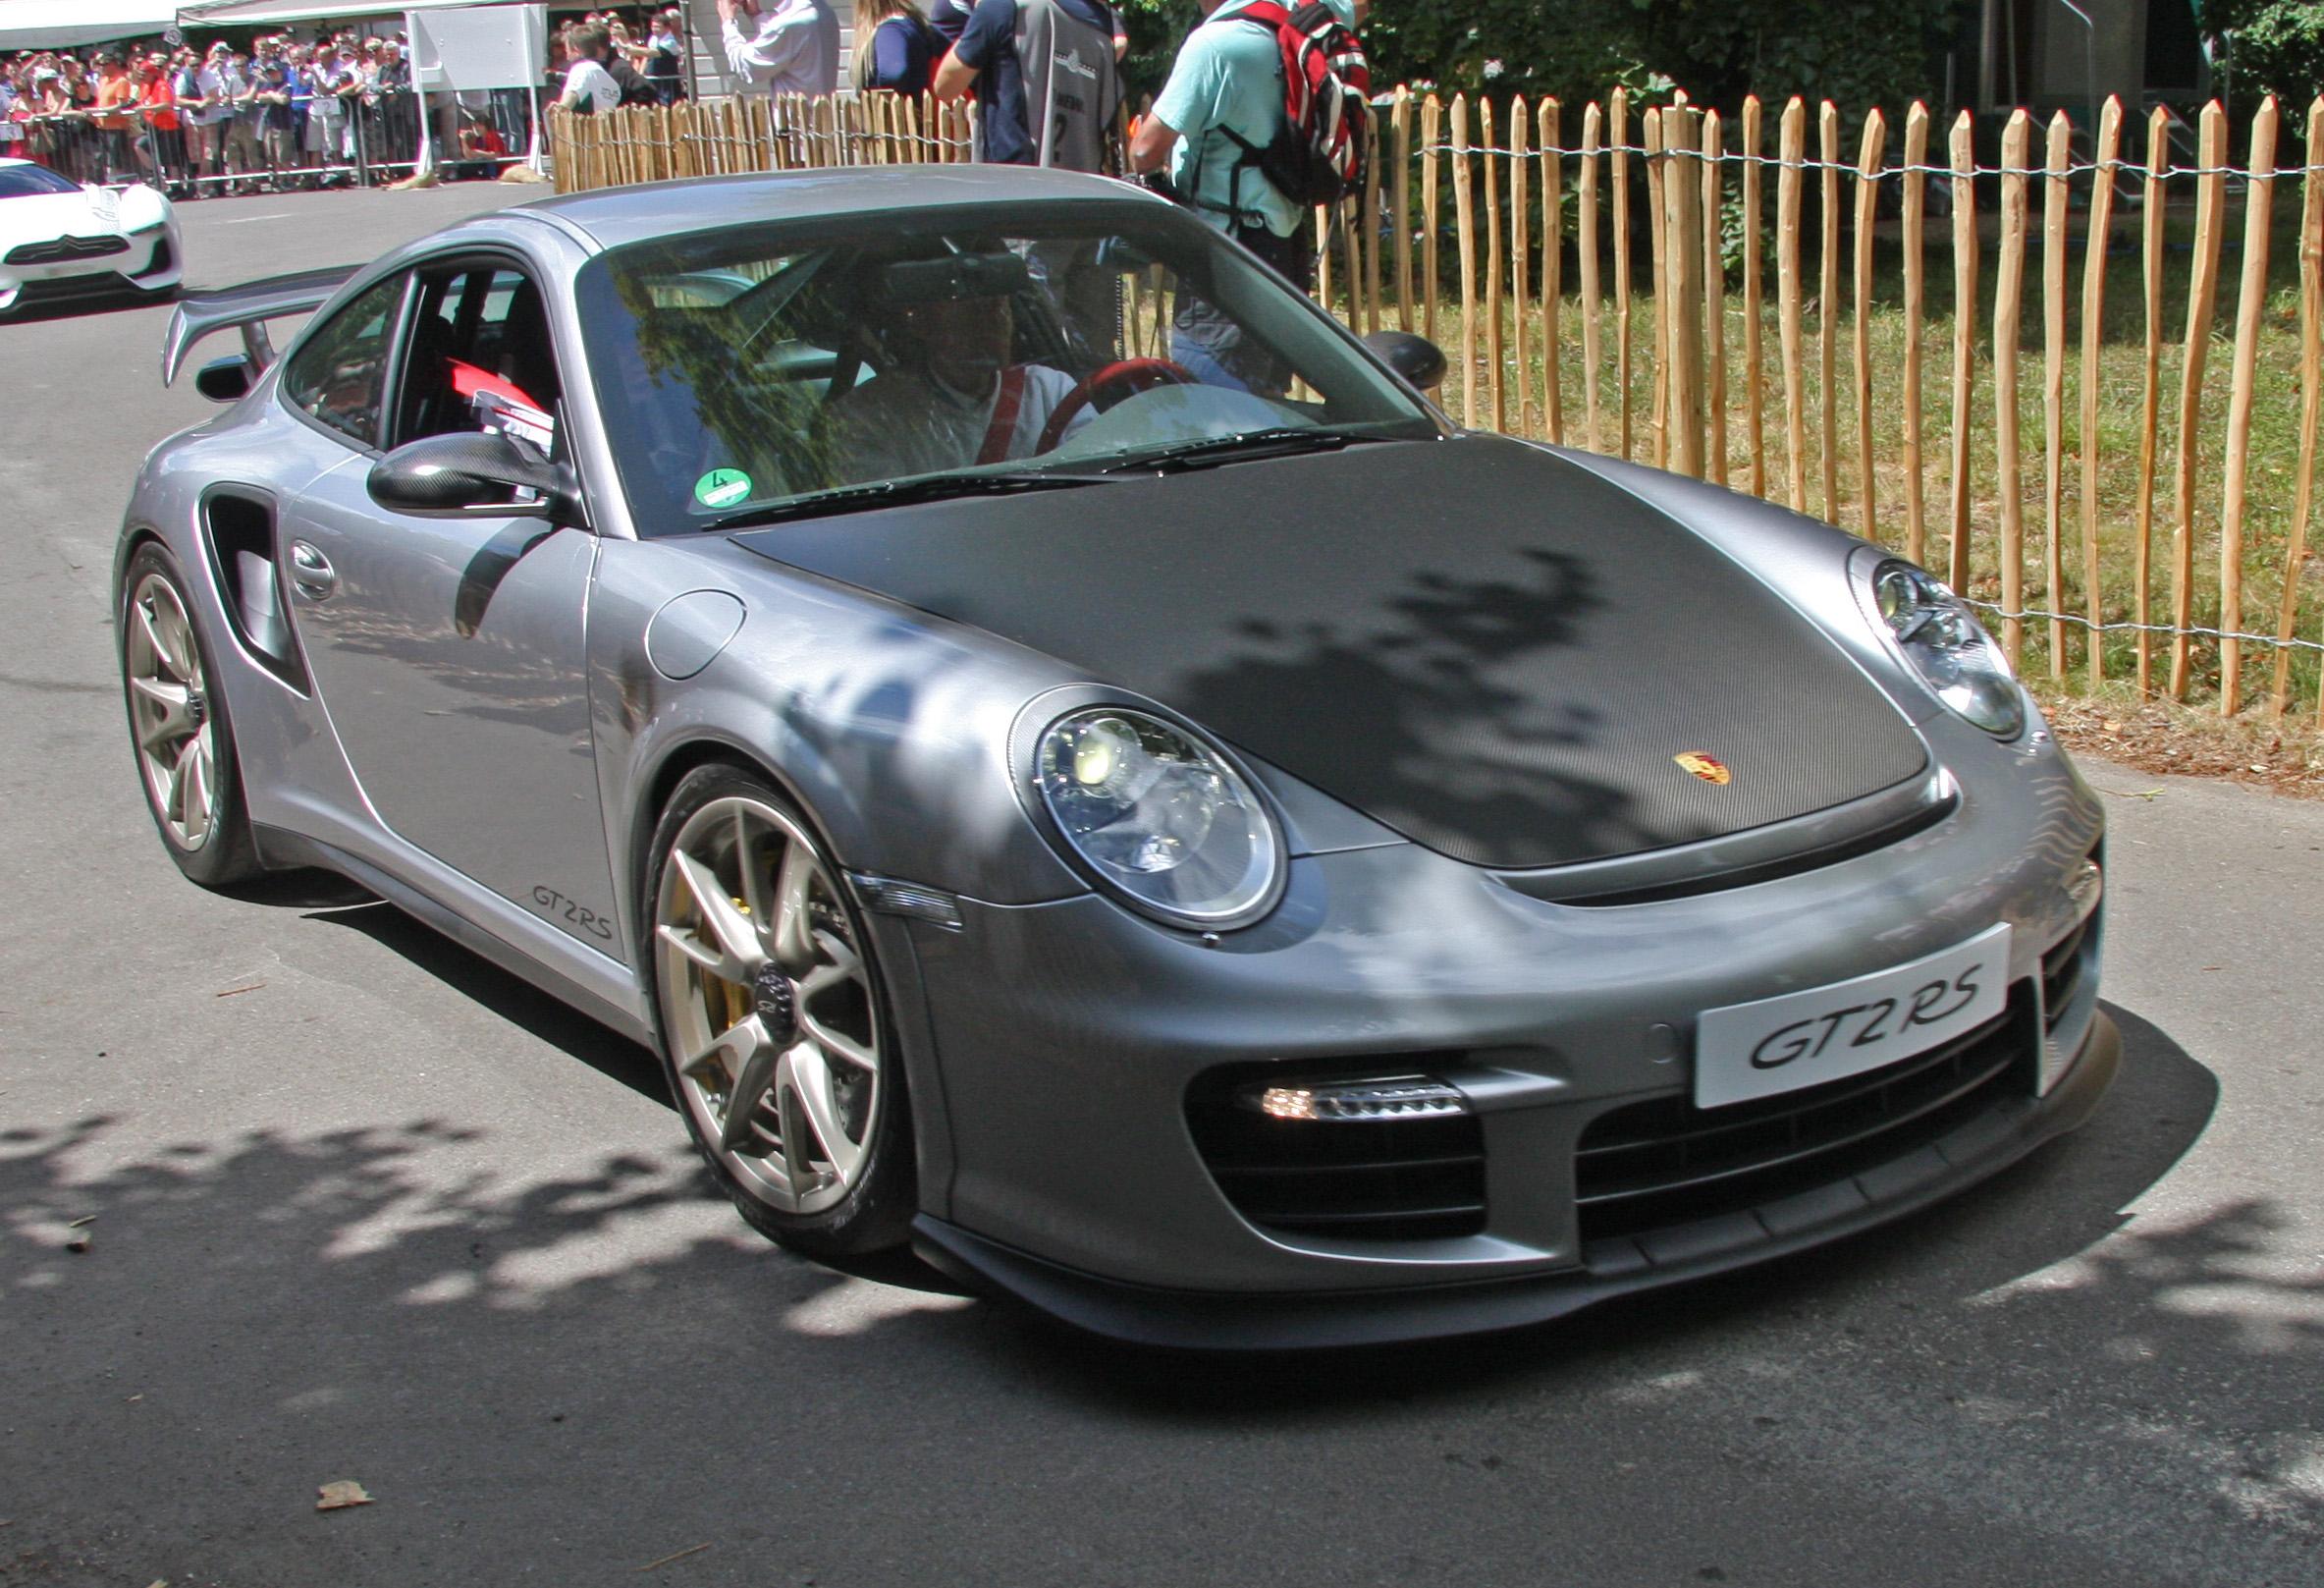 File 2010 07 04 Silver Porsche 997 Gt2 Rs 2367x1617 Jpg